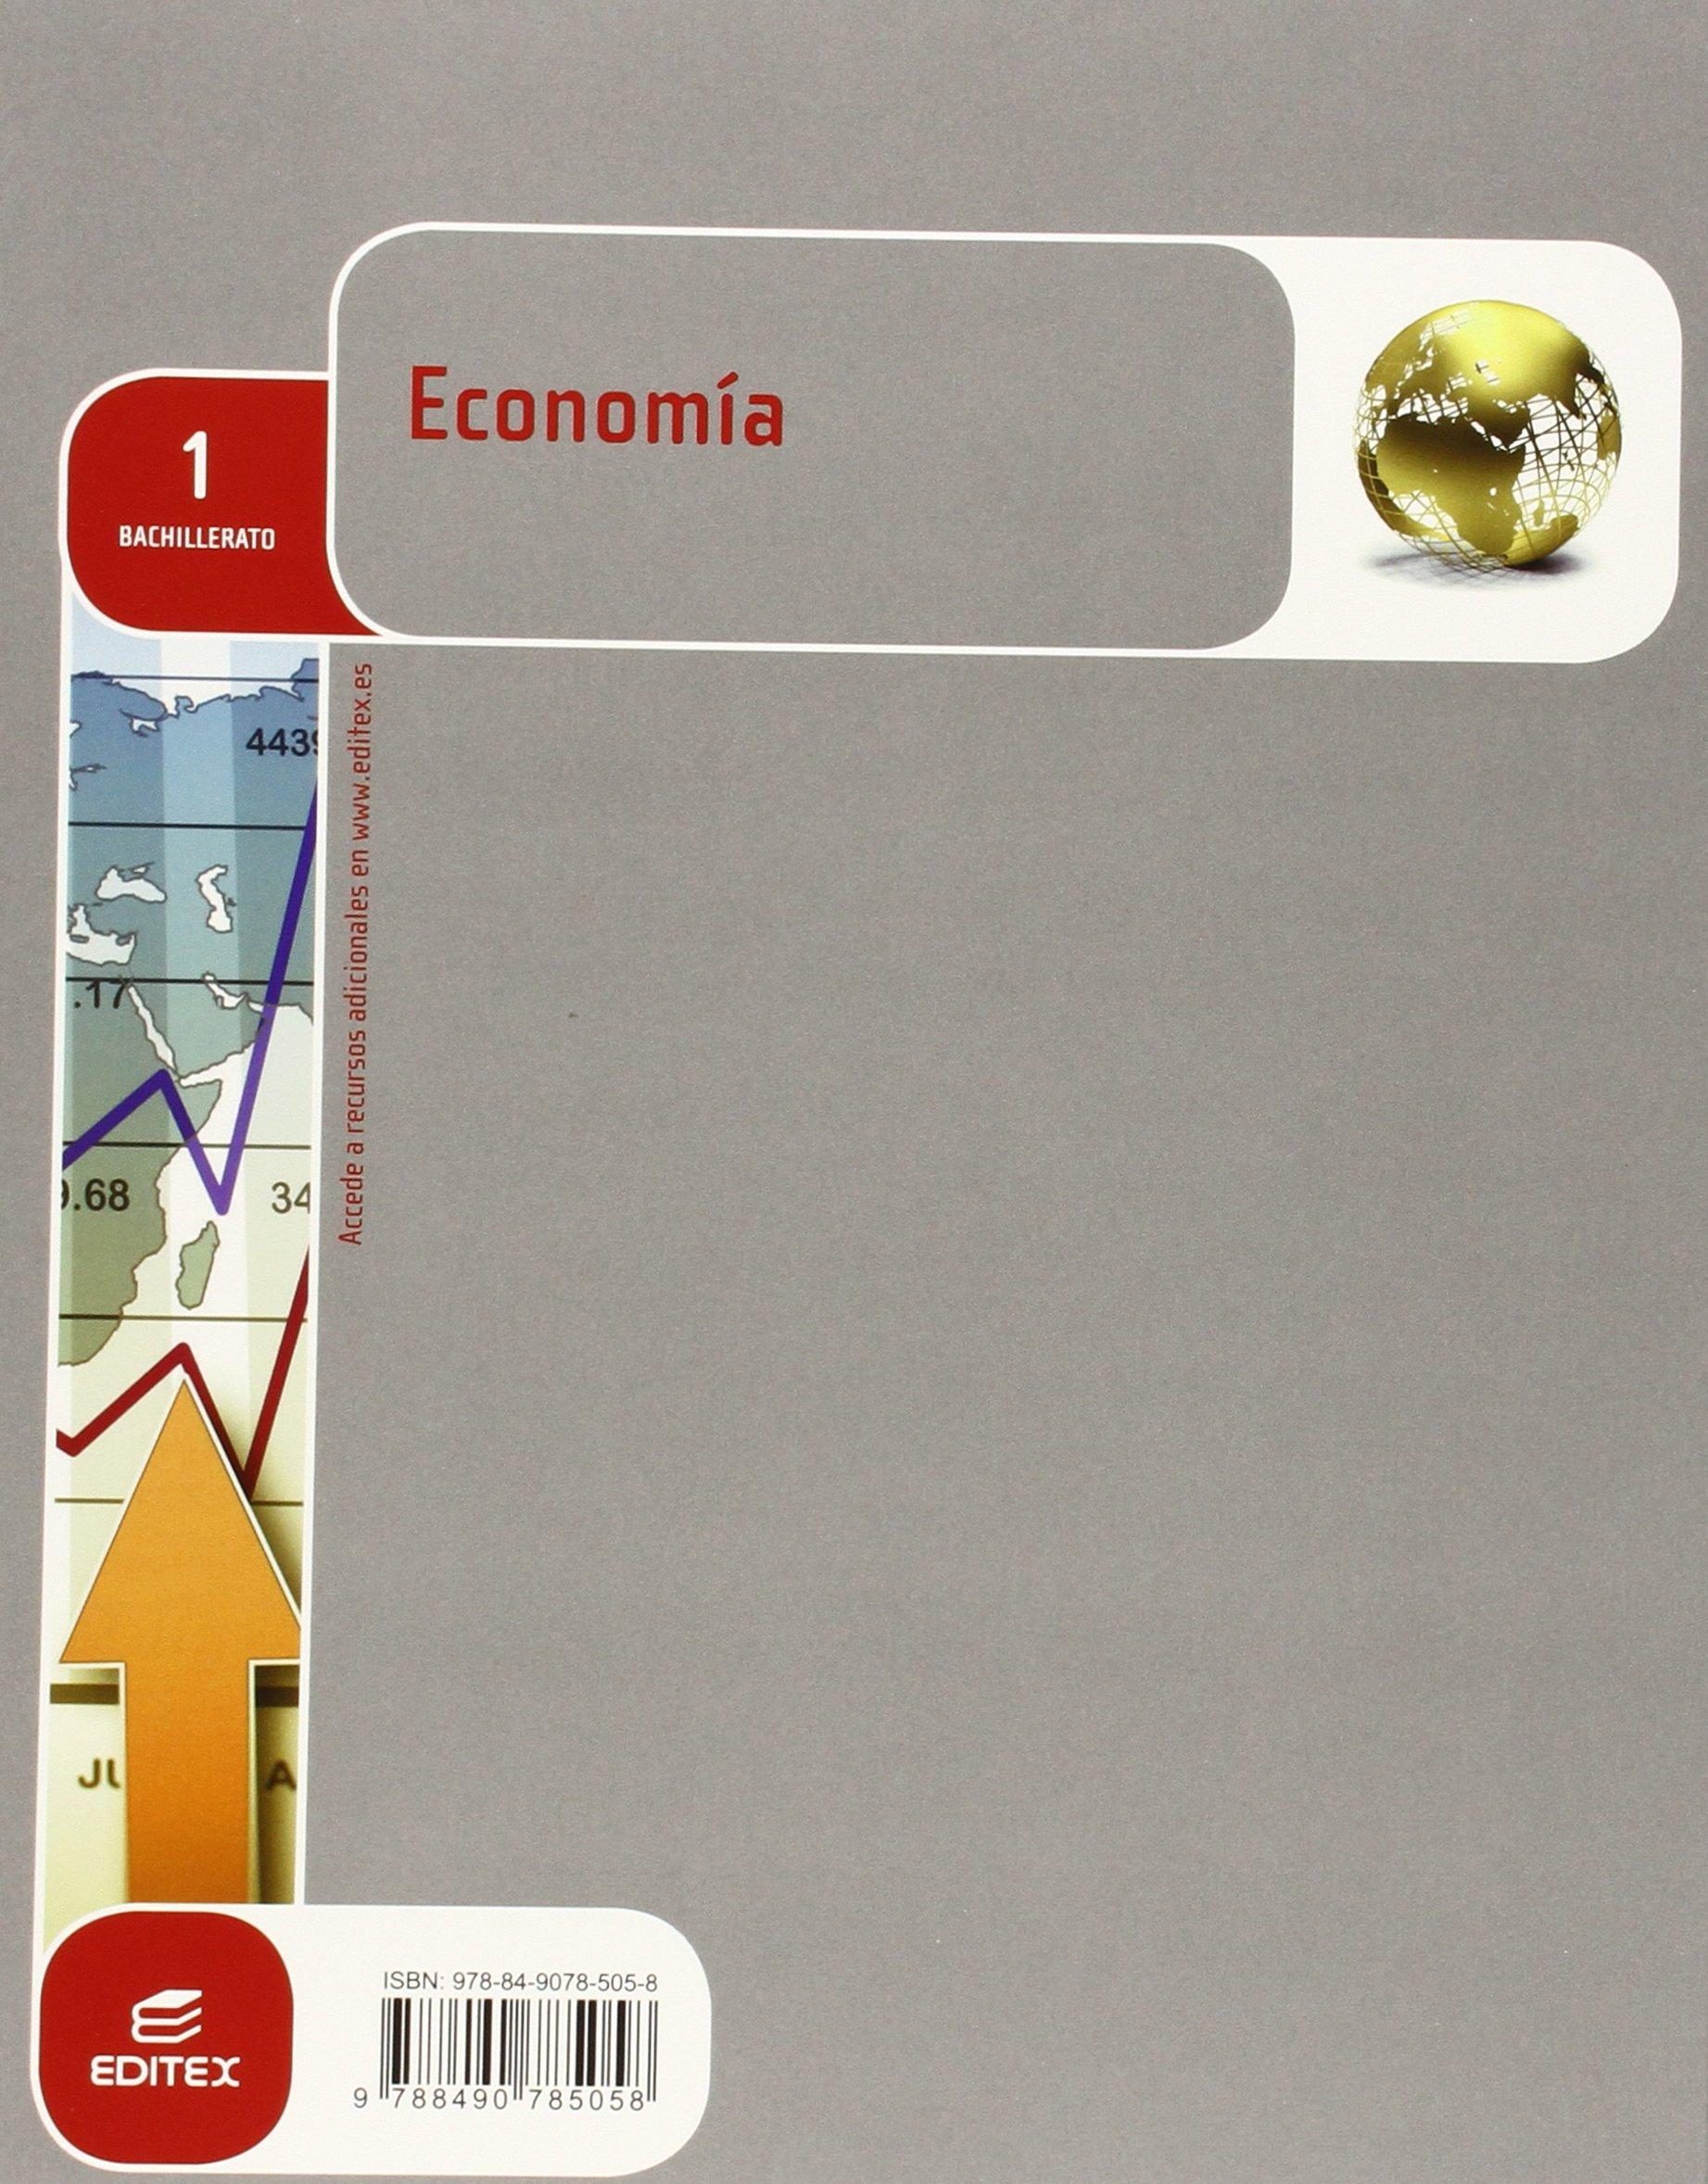 Economía 1º Bachillerato (LOMCE) - 9788490785058: Amazon.es ...